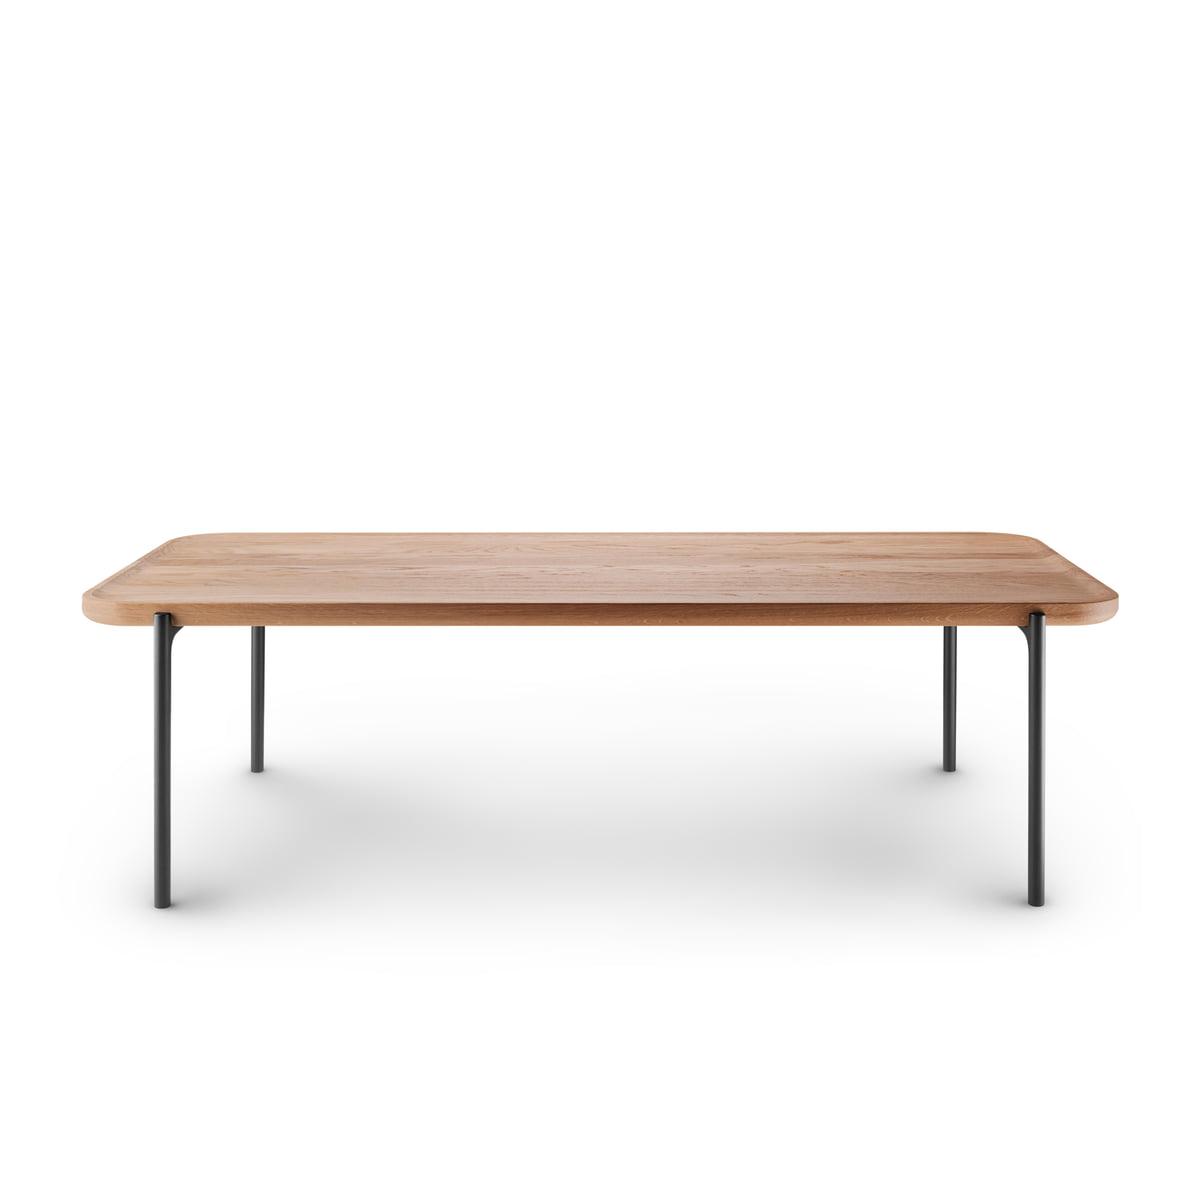 Groovy Eva Solo Savoye Coffee Table 120 X 50 Cm Oak Natural Black Beatyapartments Chair Design Images Beatyapartmentscom